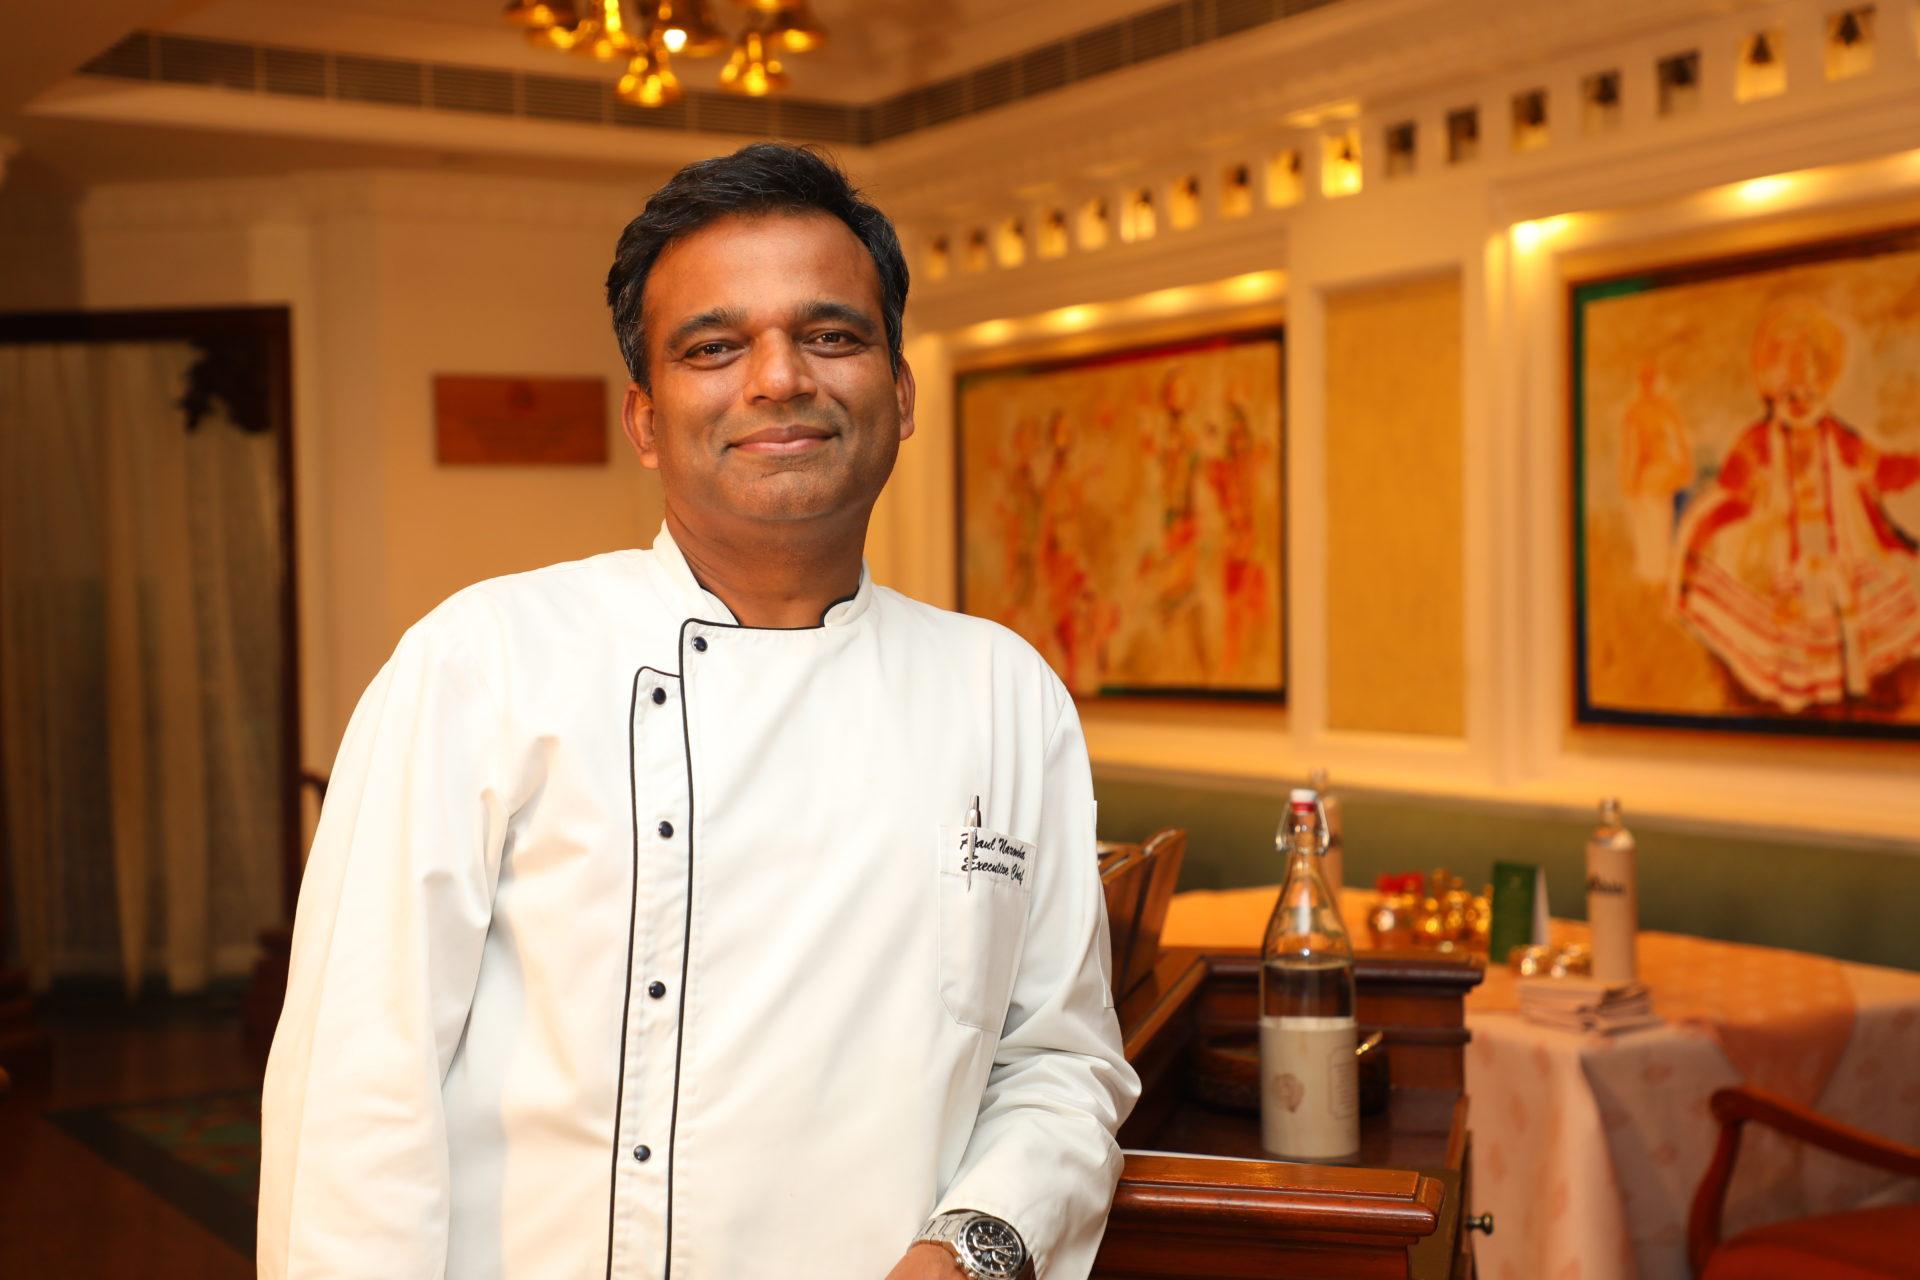 Executive Chef, Paul Noronha